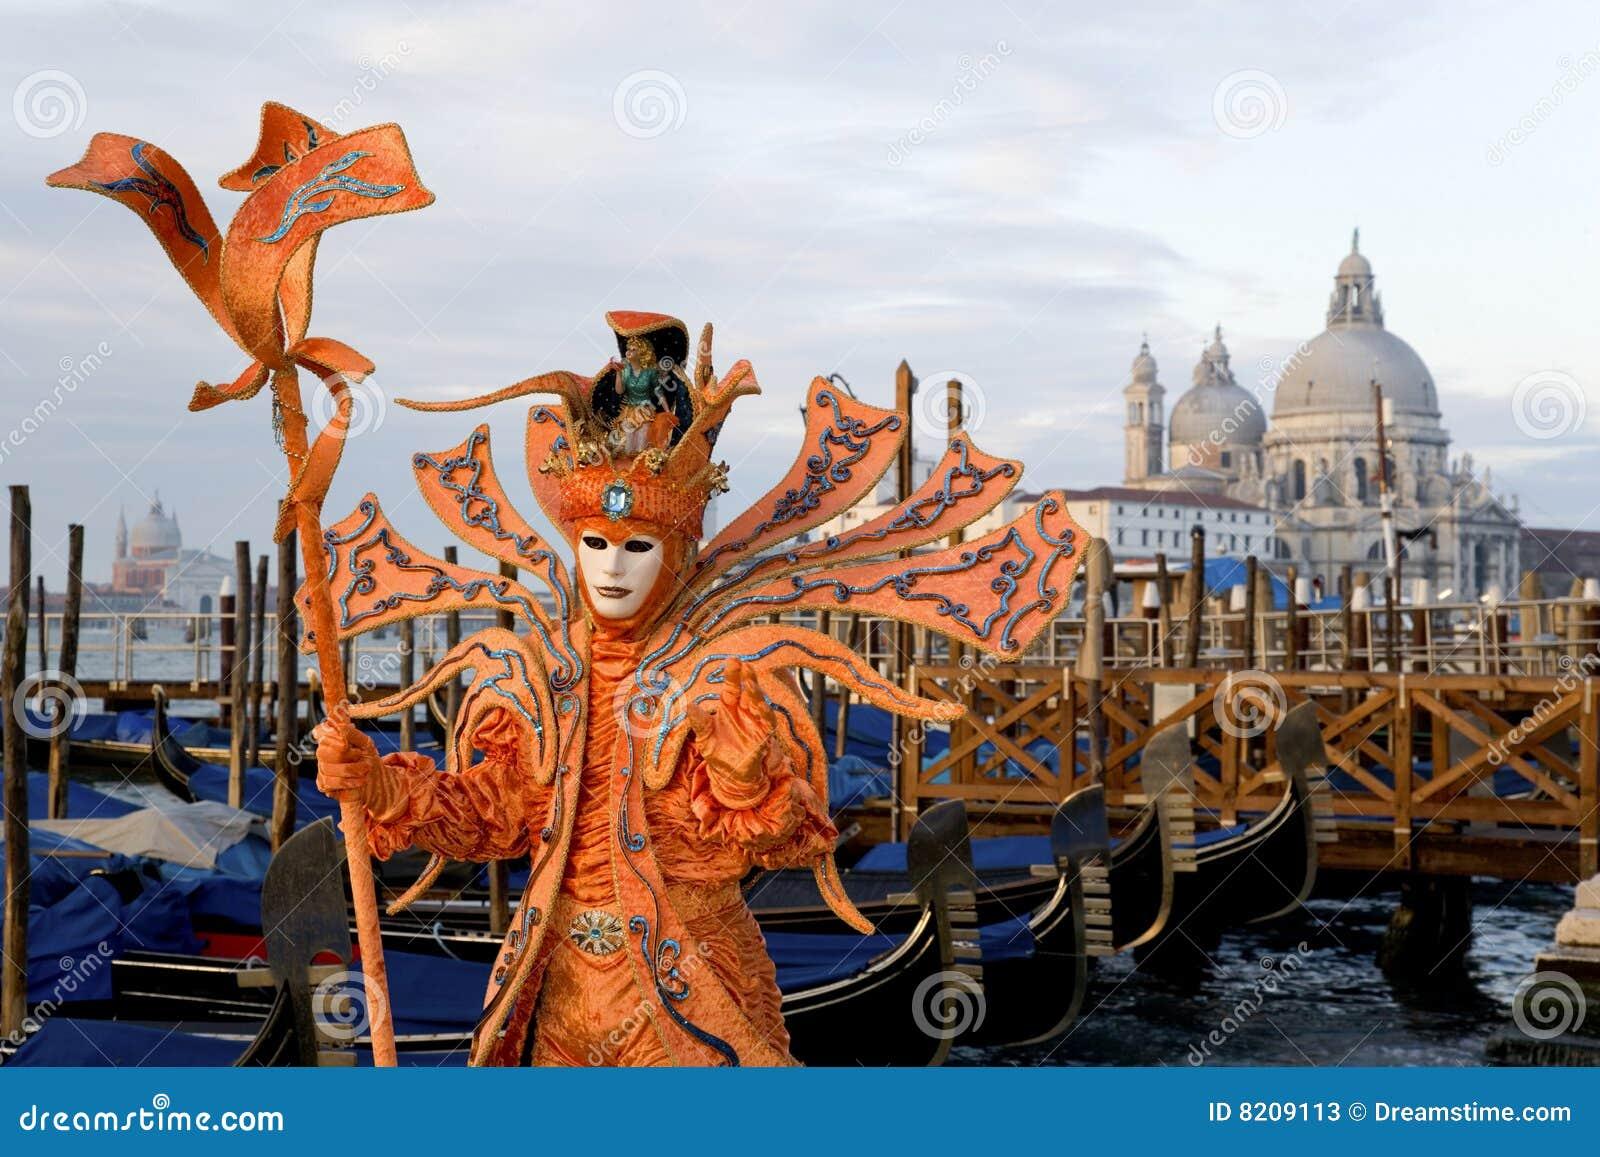 venetie chat Venice (/ ˈ v ɛ n ɪ s /, ven-iss italian: venezia, [veˈnɛttsja] ( listen) venetian: venesia, ) is a city in northeastern italy and the capital of the veneto region.